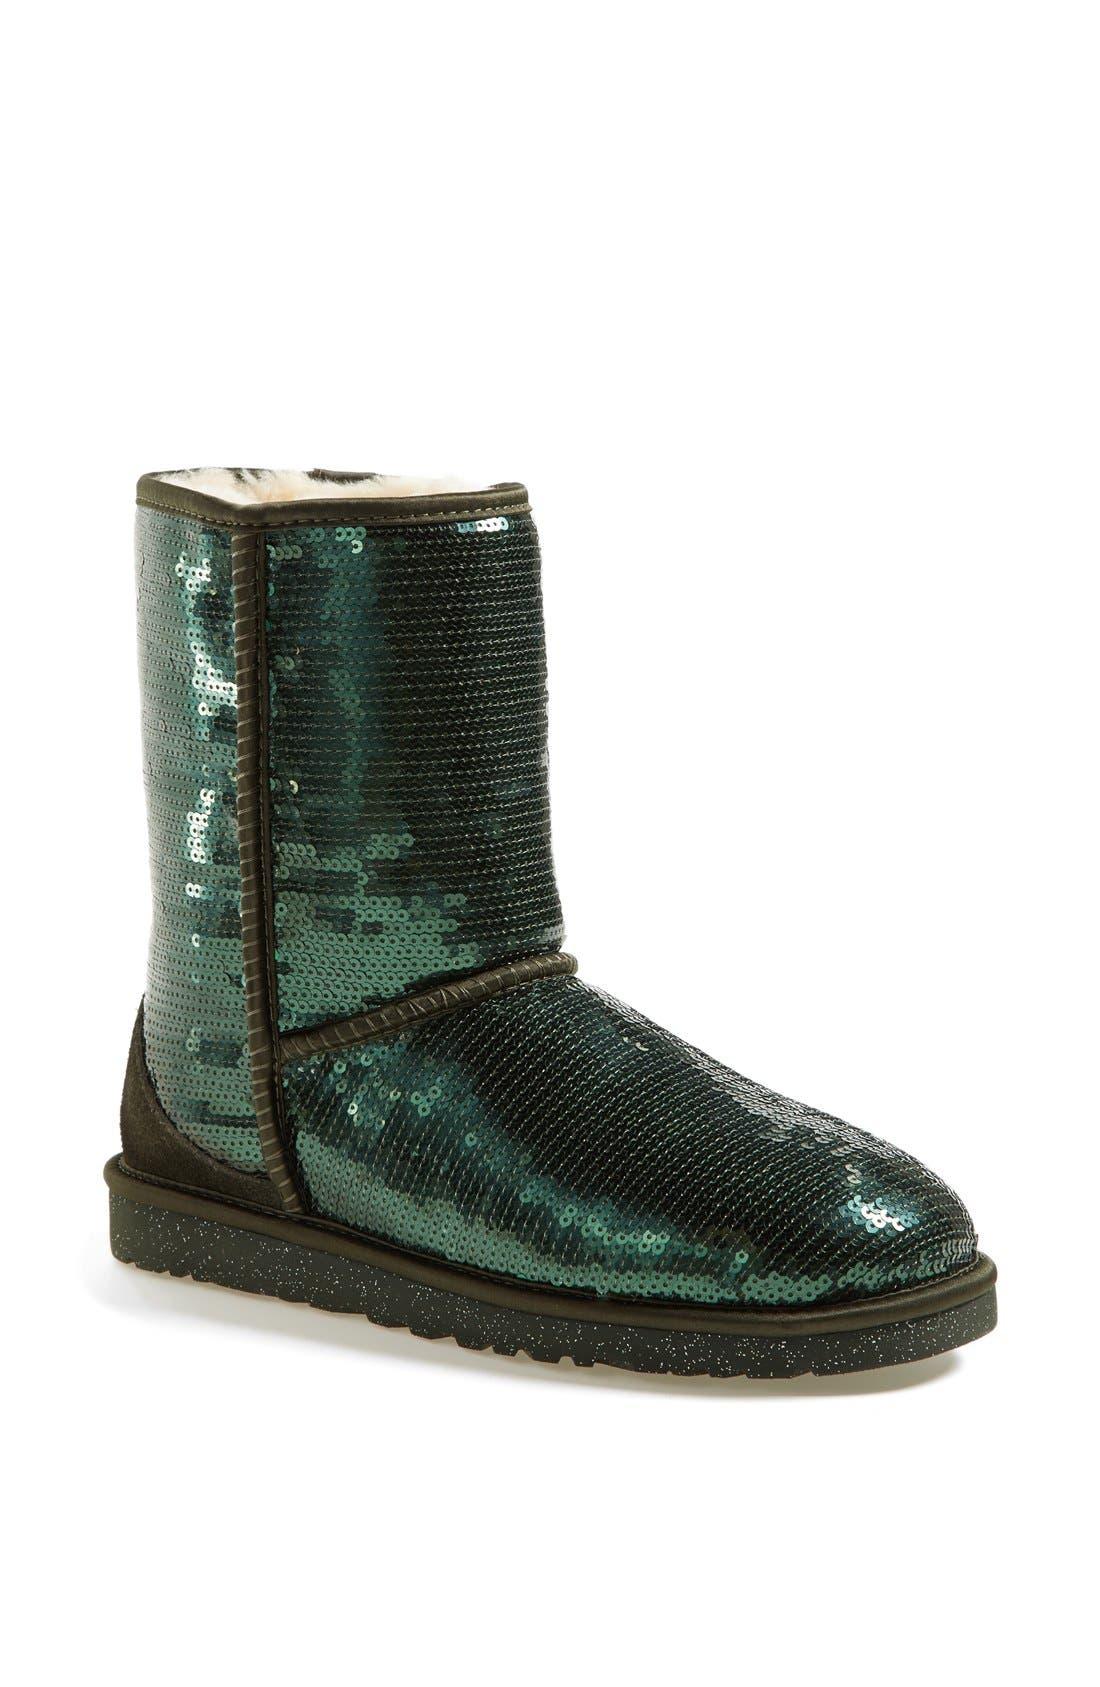 Main Image - UGG® Australia 'Classic Short Sparkles' Boot (Women)